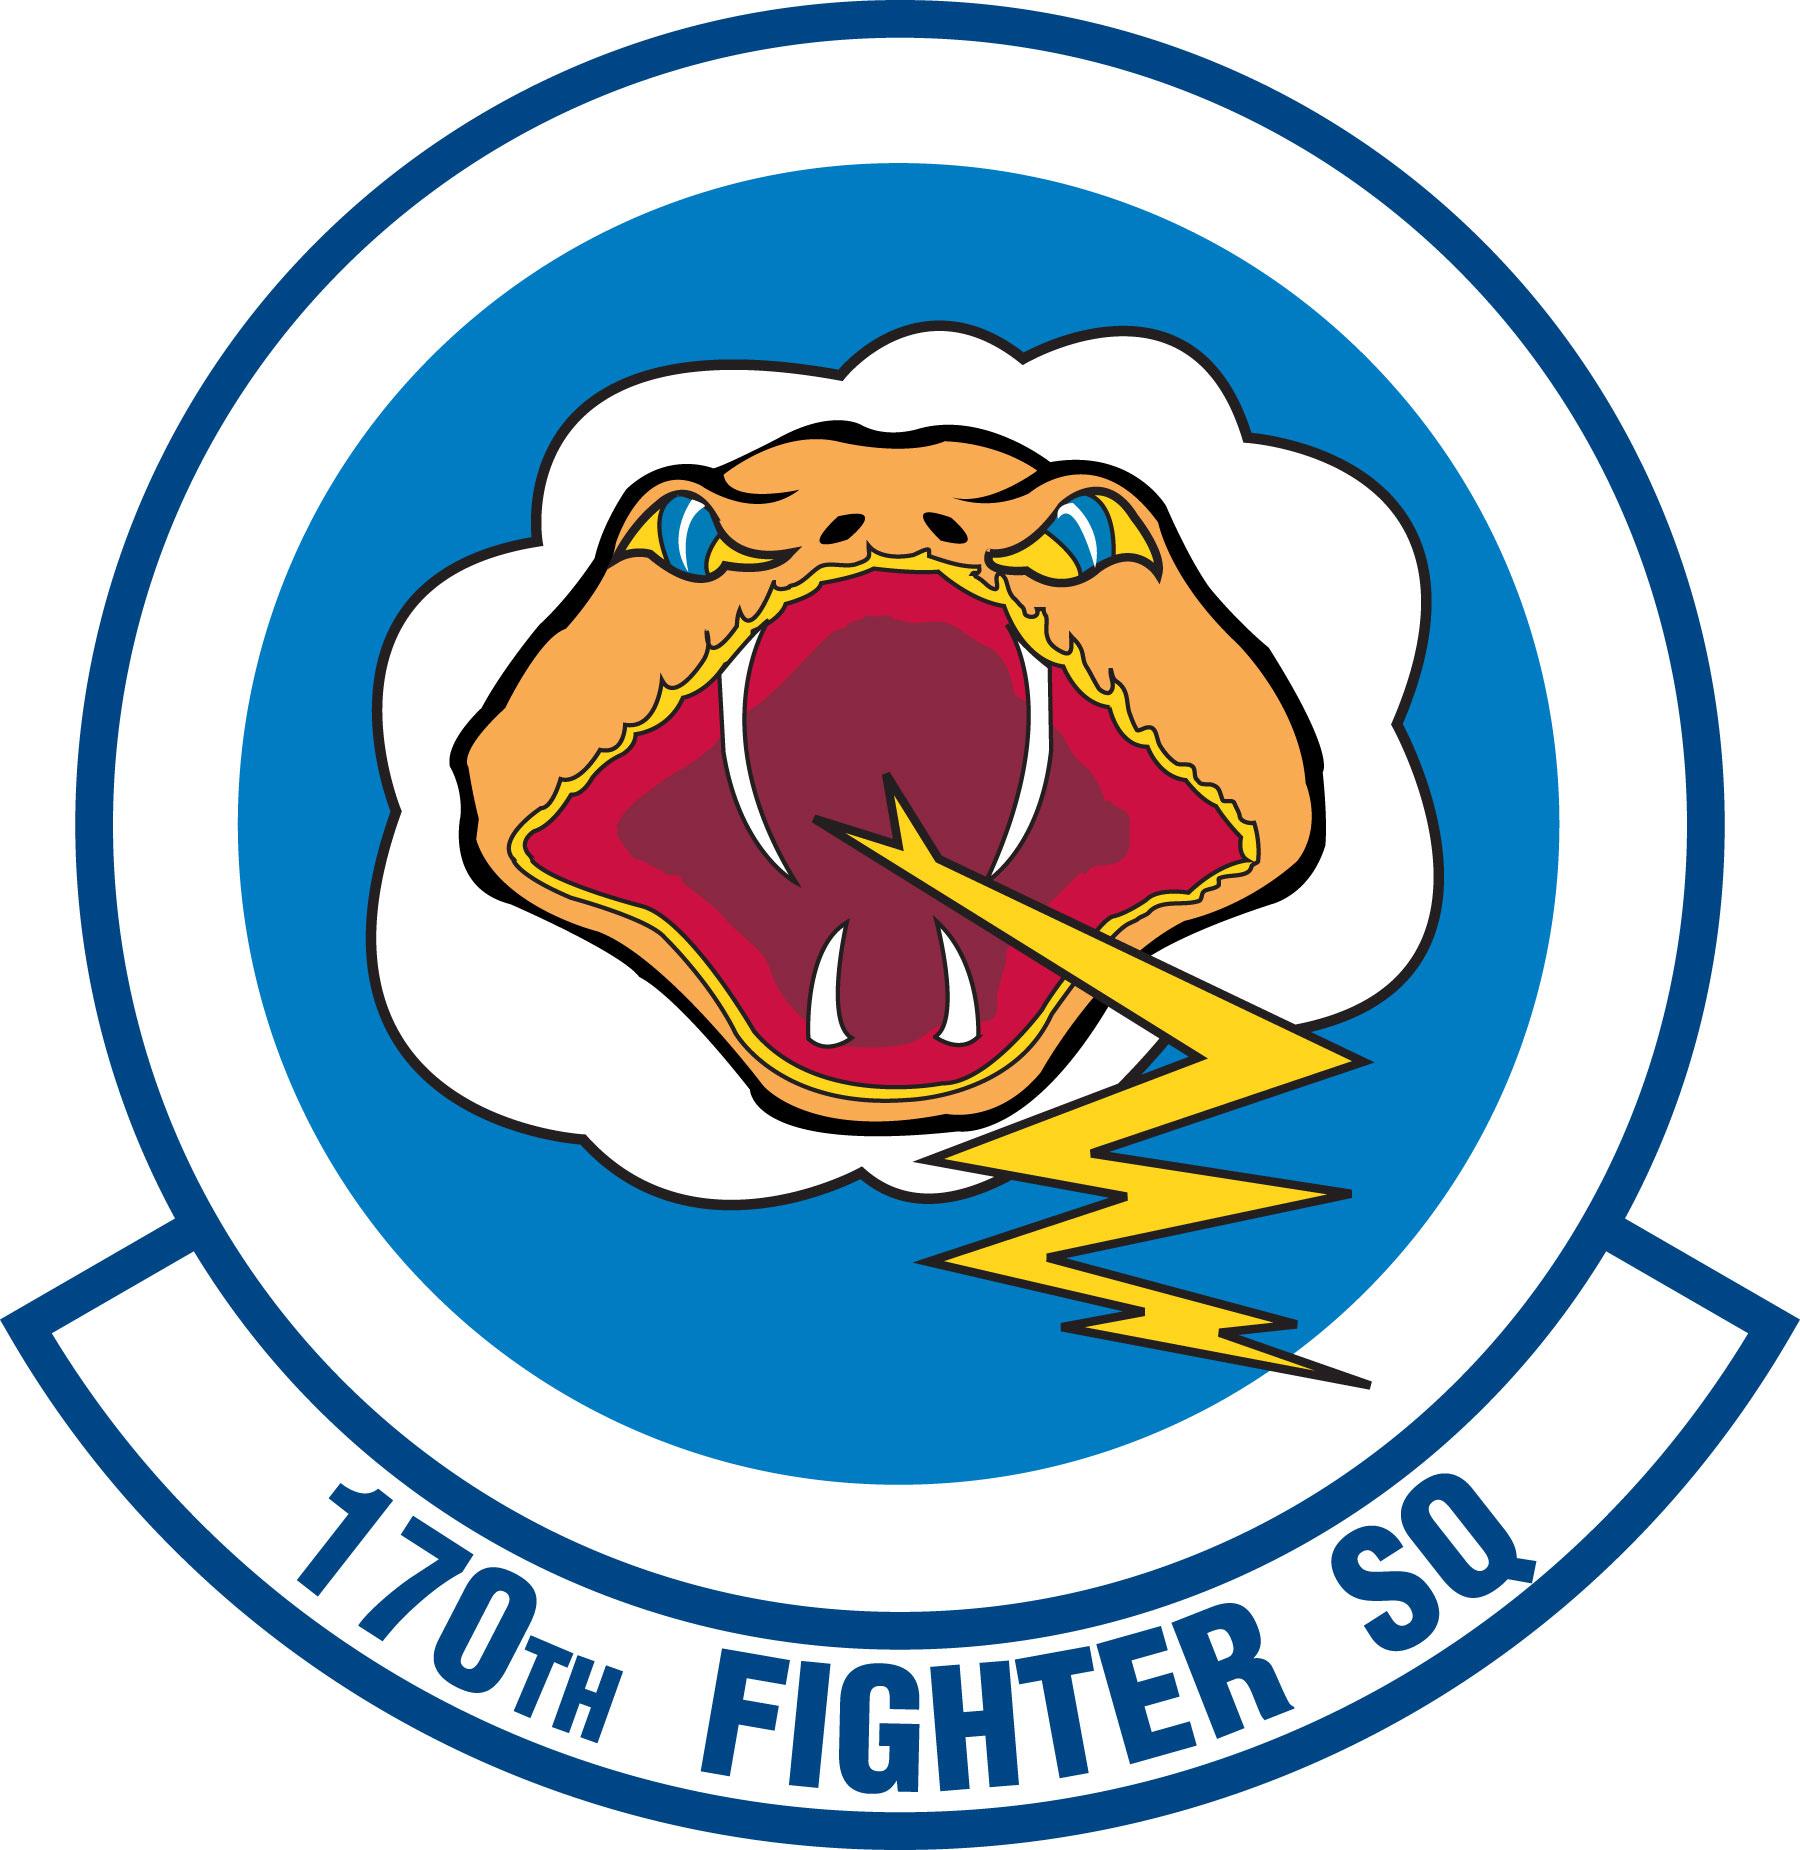 Fighter Squadron Logos File:170th Fighter Squadron